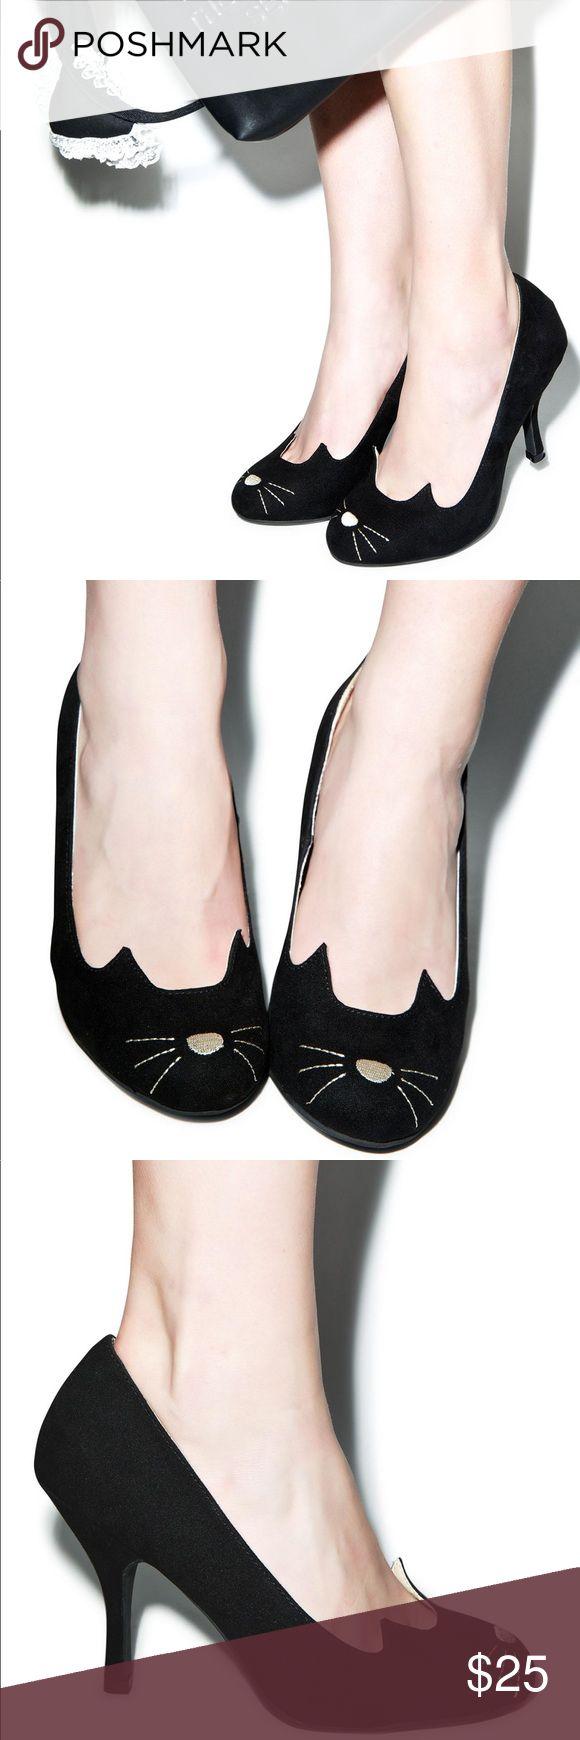 T.U.K SOPHISTAKITTY HEELS T.U.K. Sophistakitty Heels, denn jedes Outfit könnte …   – My Posh Closet